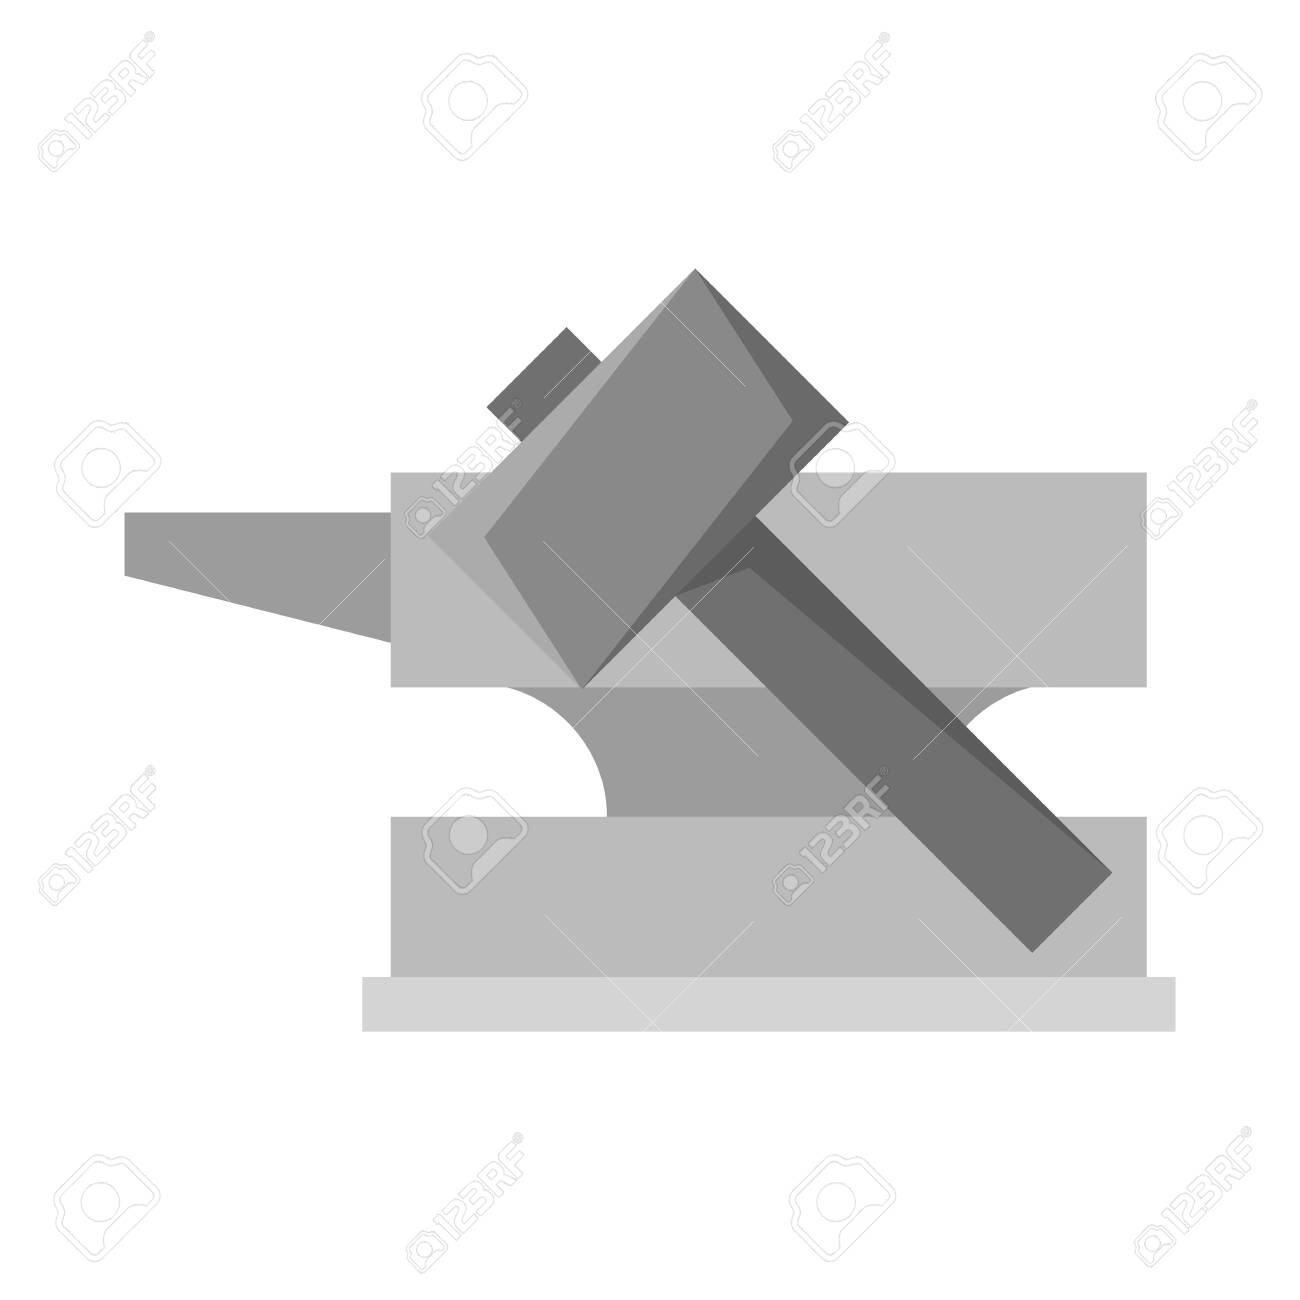 Vector Illustration Of Hammer And Hephaestus Symbol Set Of Hammer